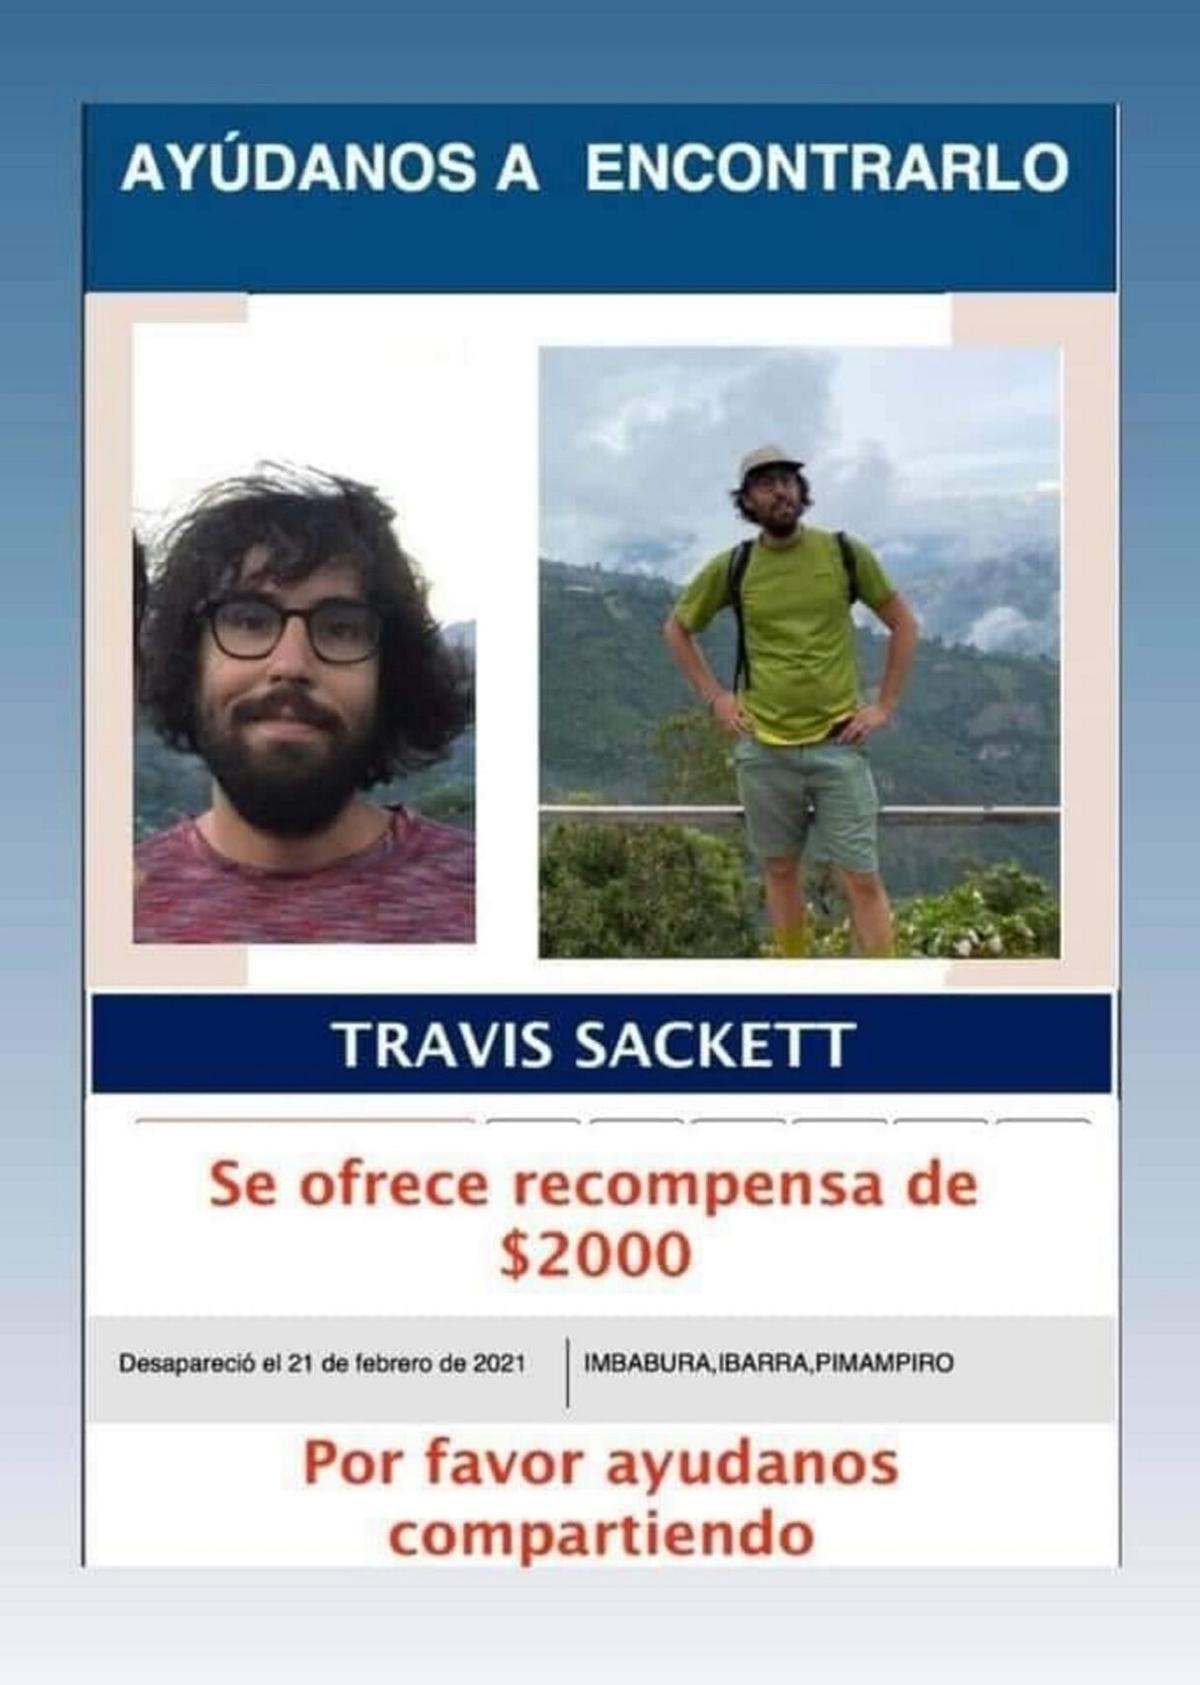 Batavia native missing in Ecuador